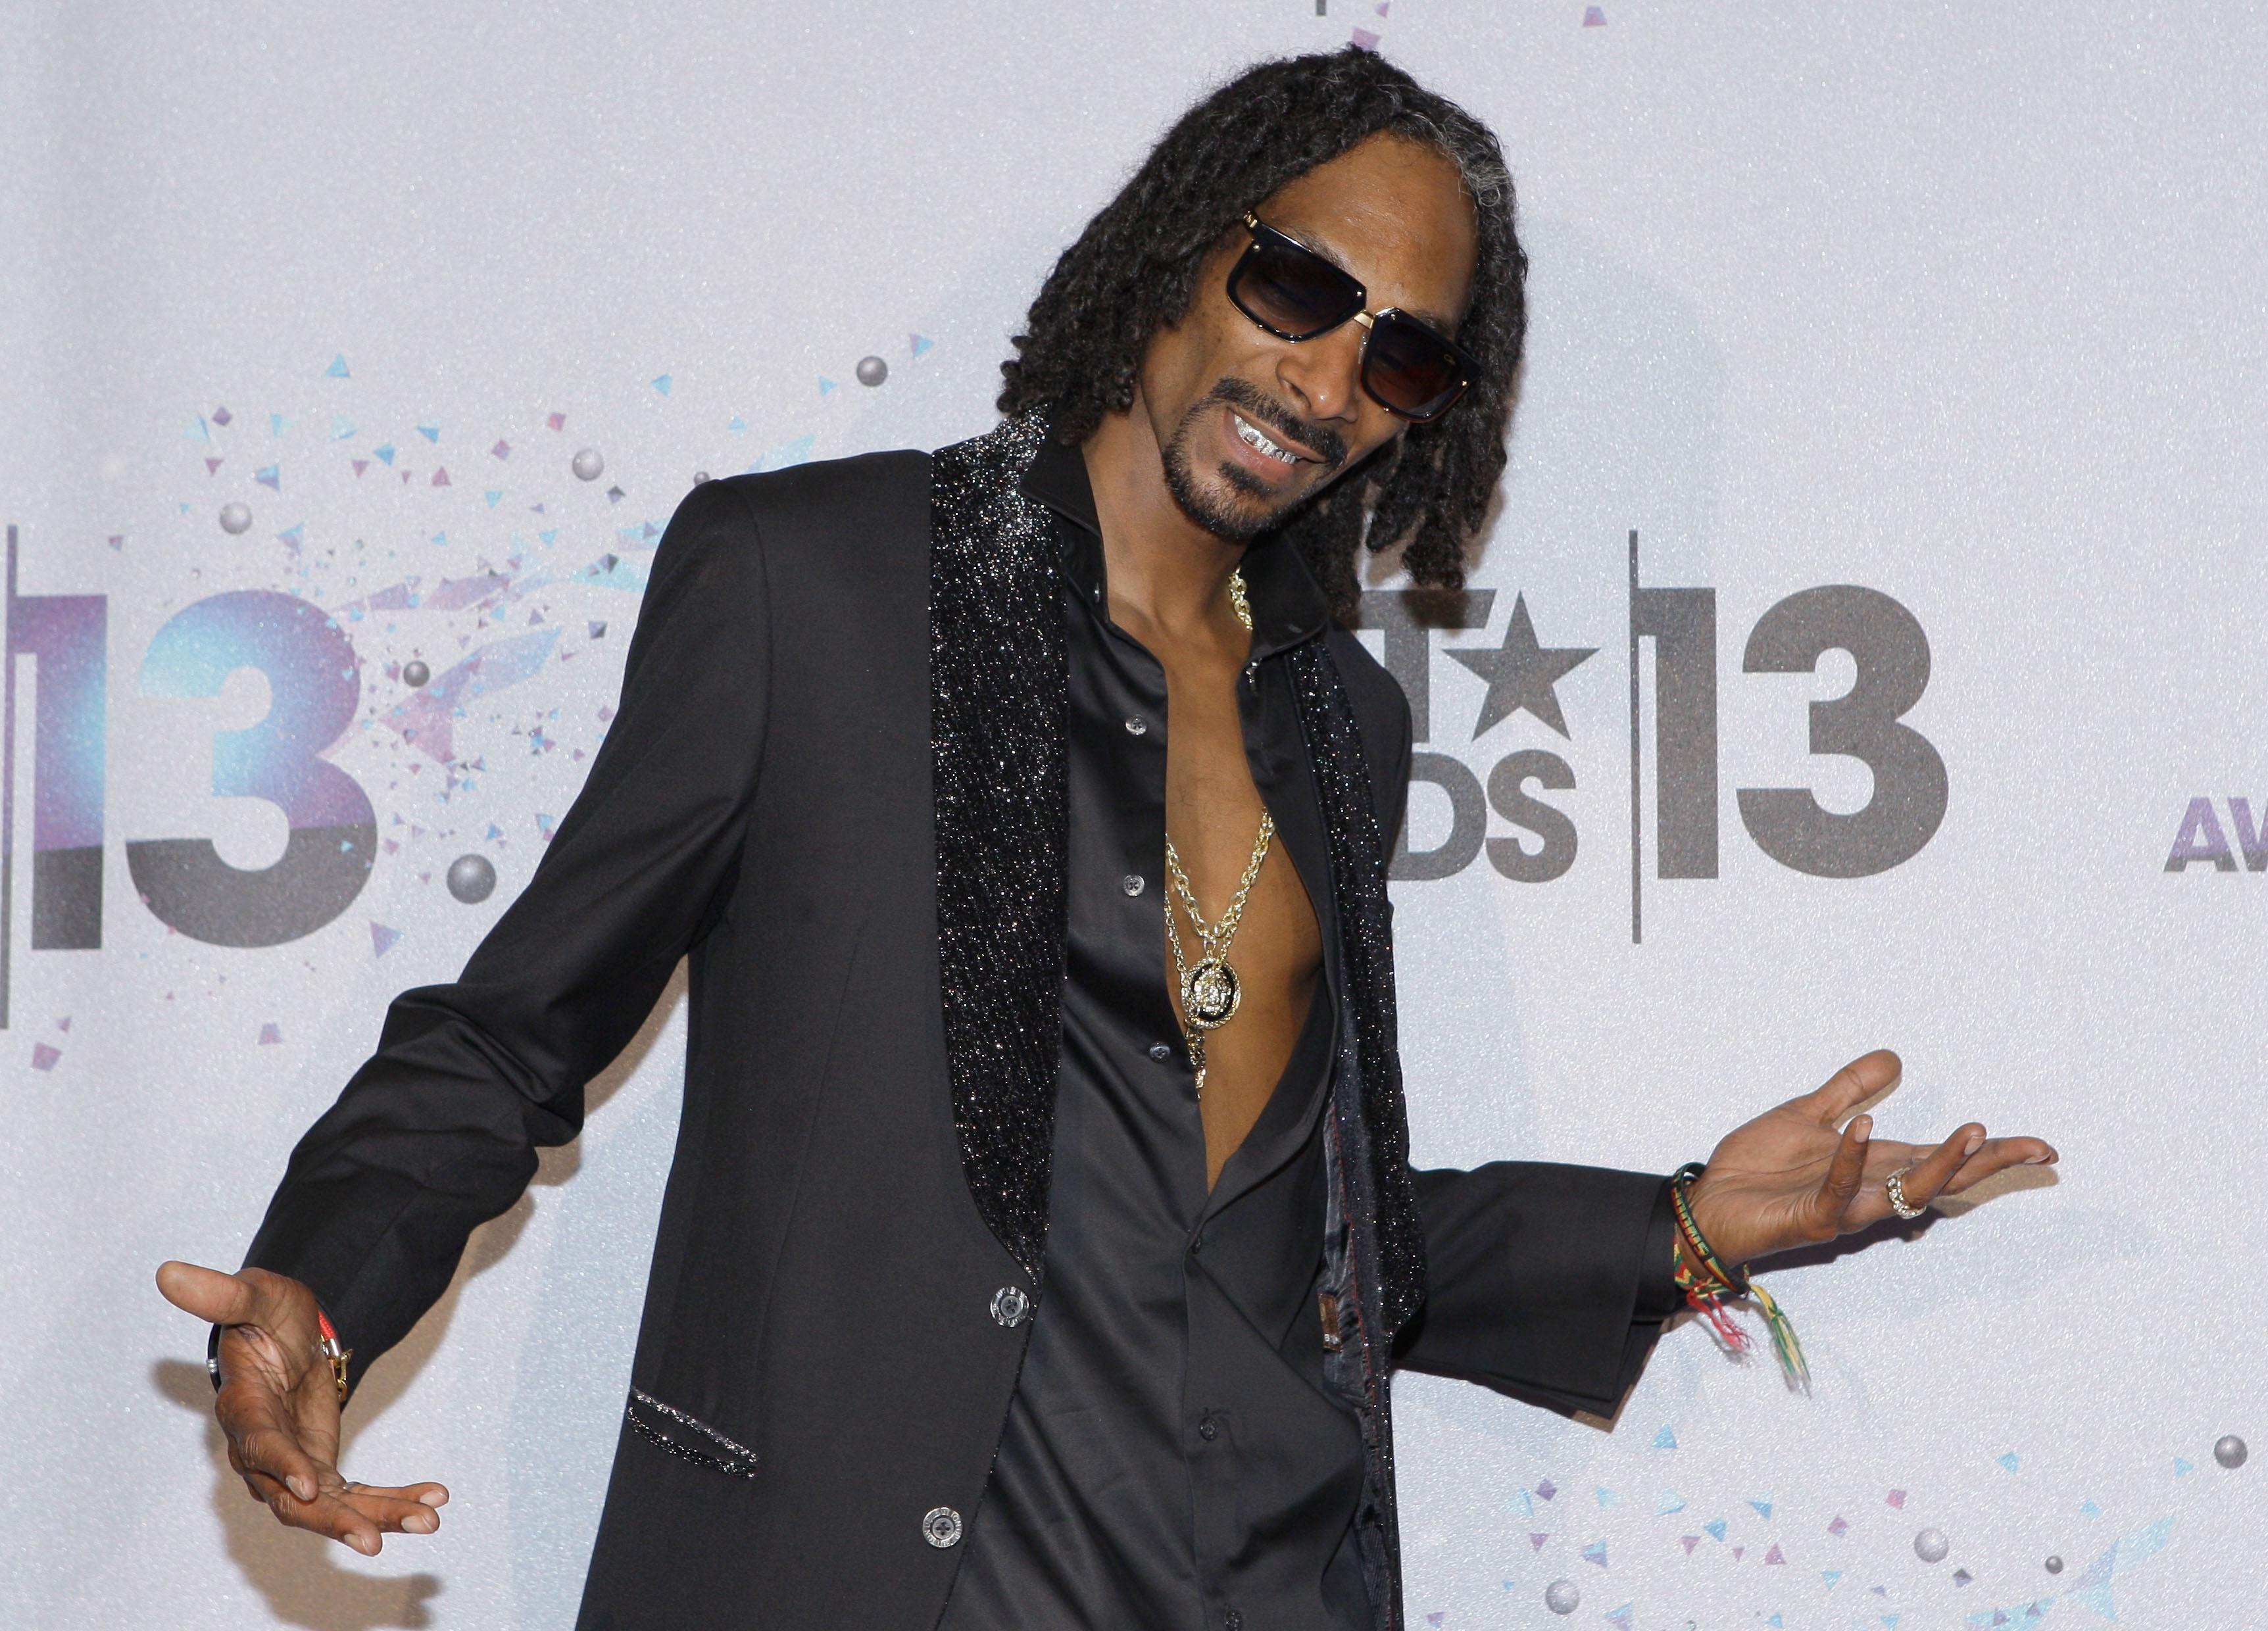 Snoop Dogg Hd Background